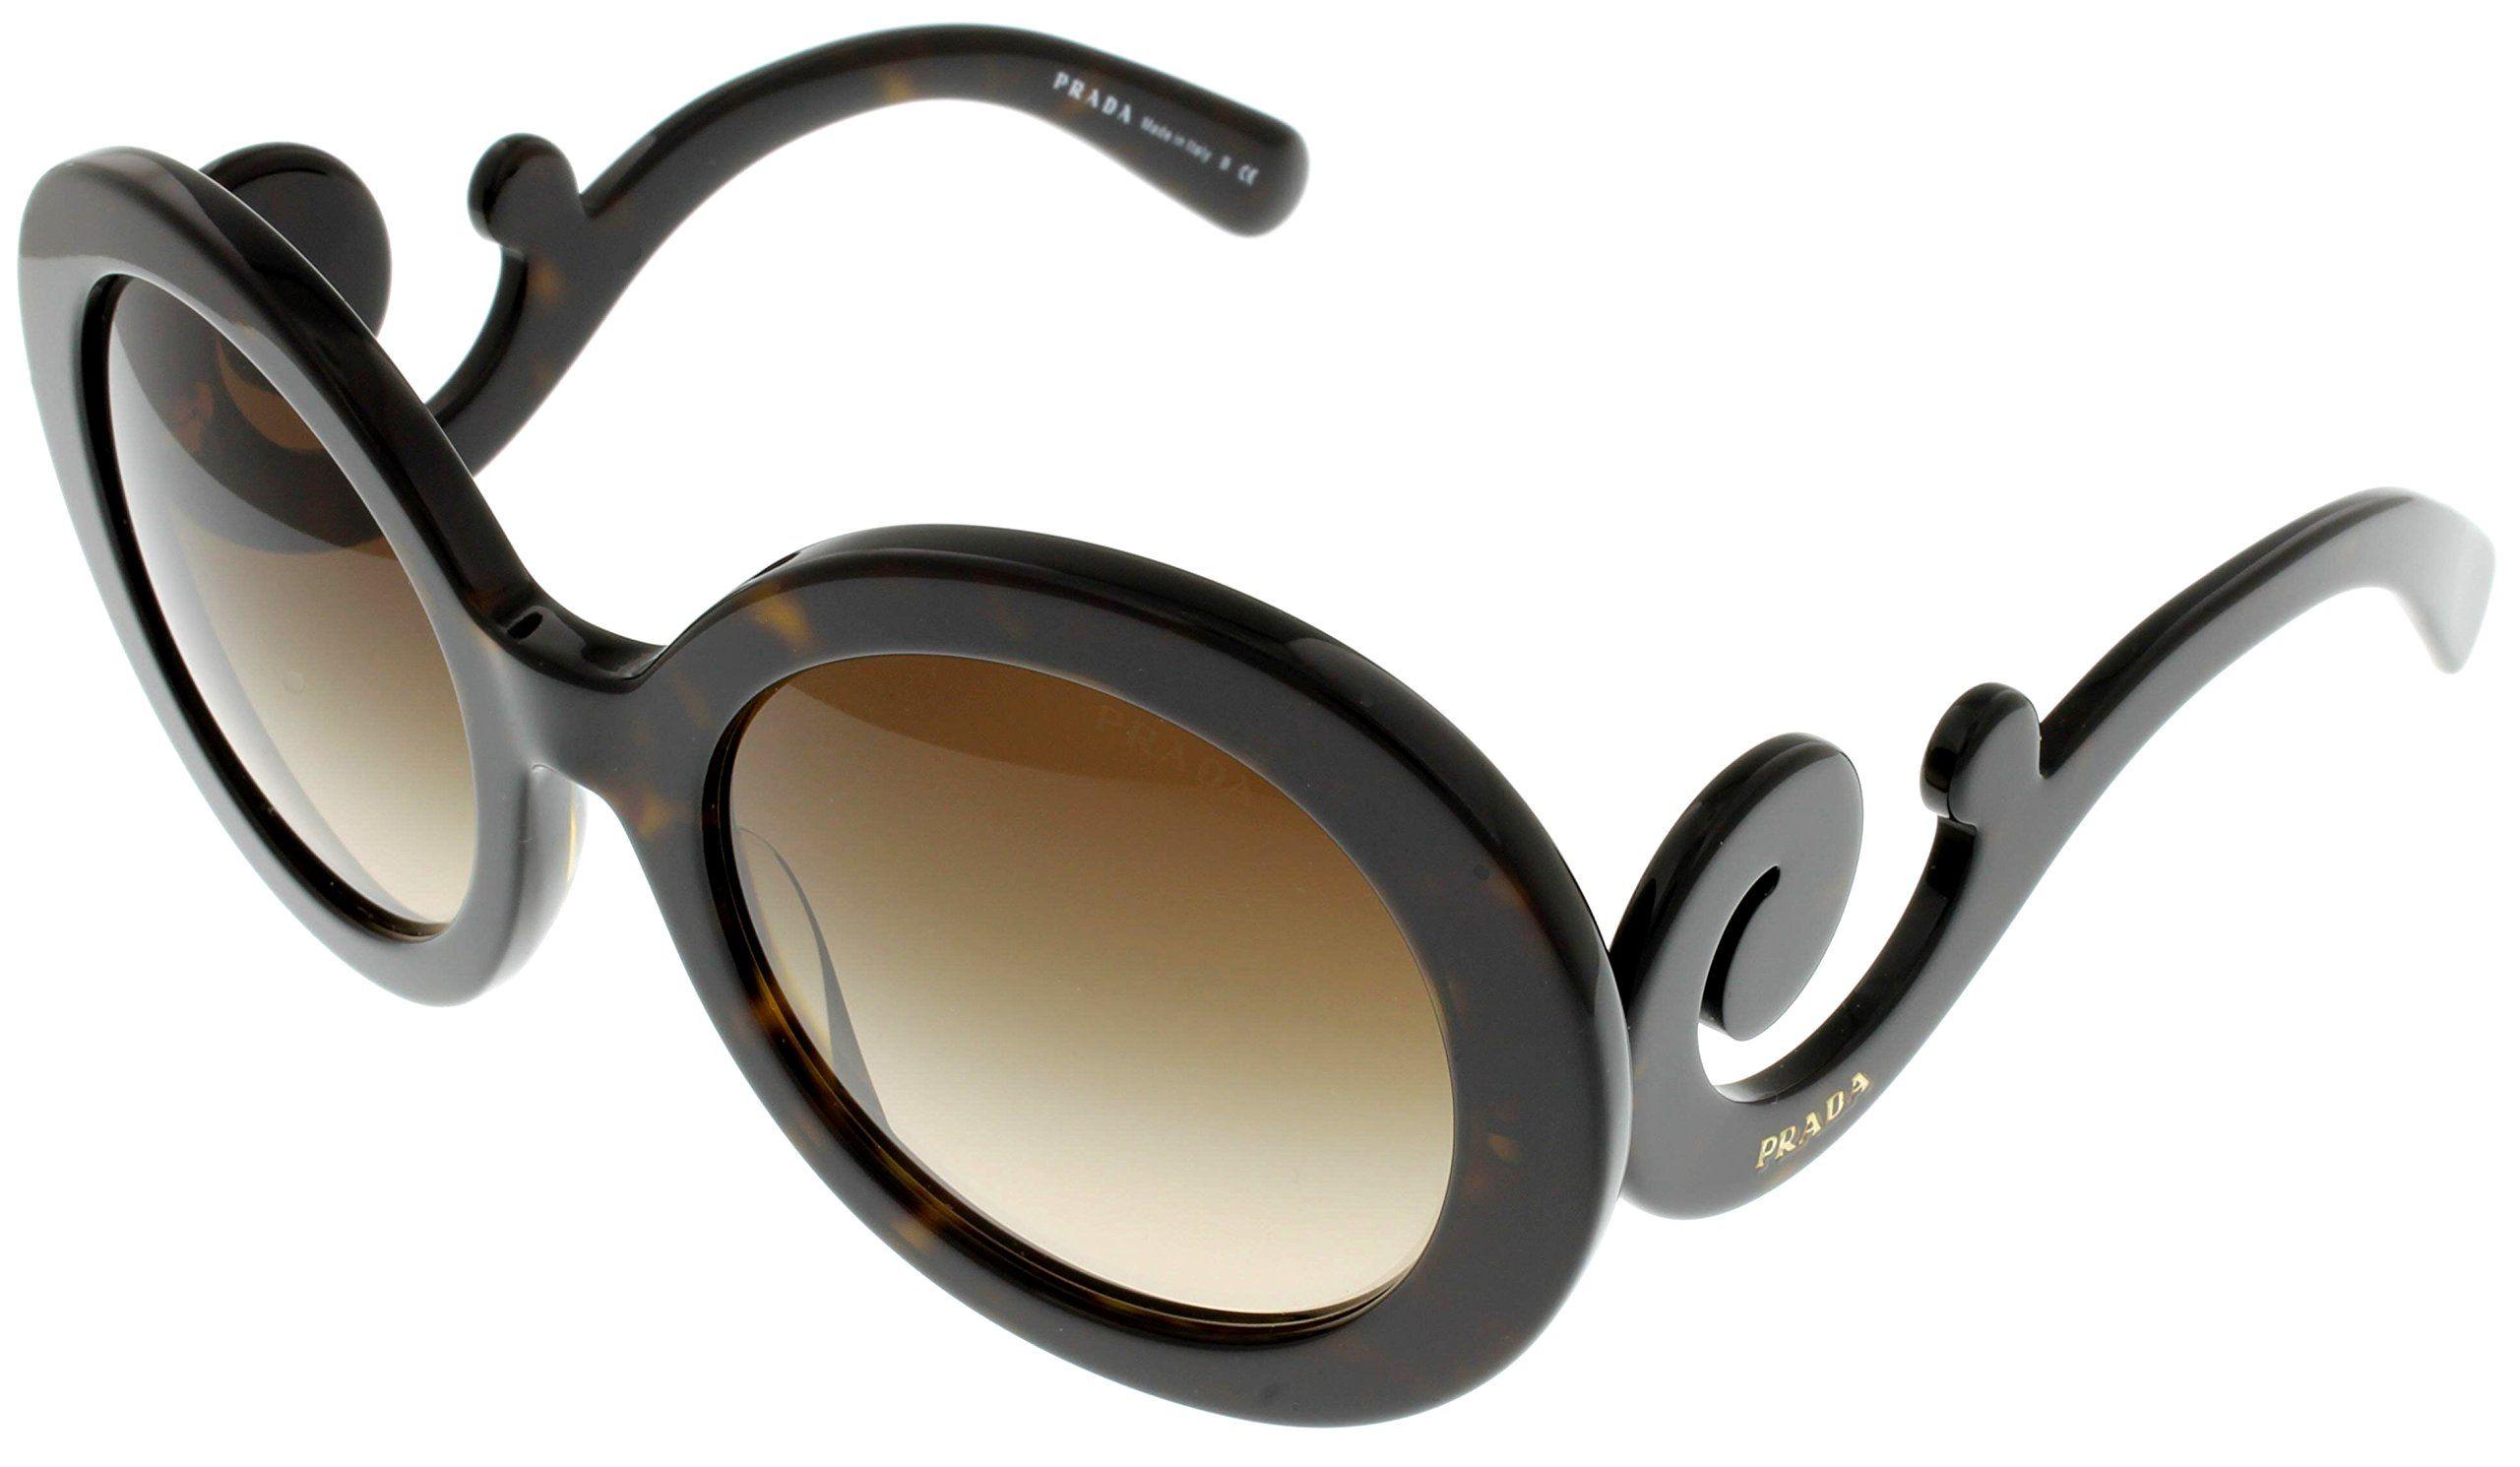 Prada Sunglasses Women Havana PR27NS 2AU-6S1 Round. Frame Color: Dark Havana. Lens Color: Brown. Gender: womens. Case Included. Made in: Italy.